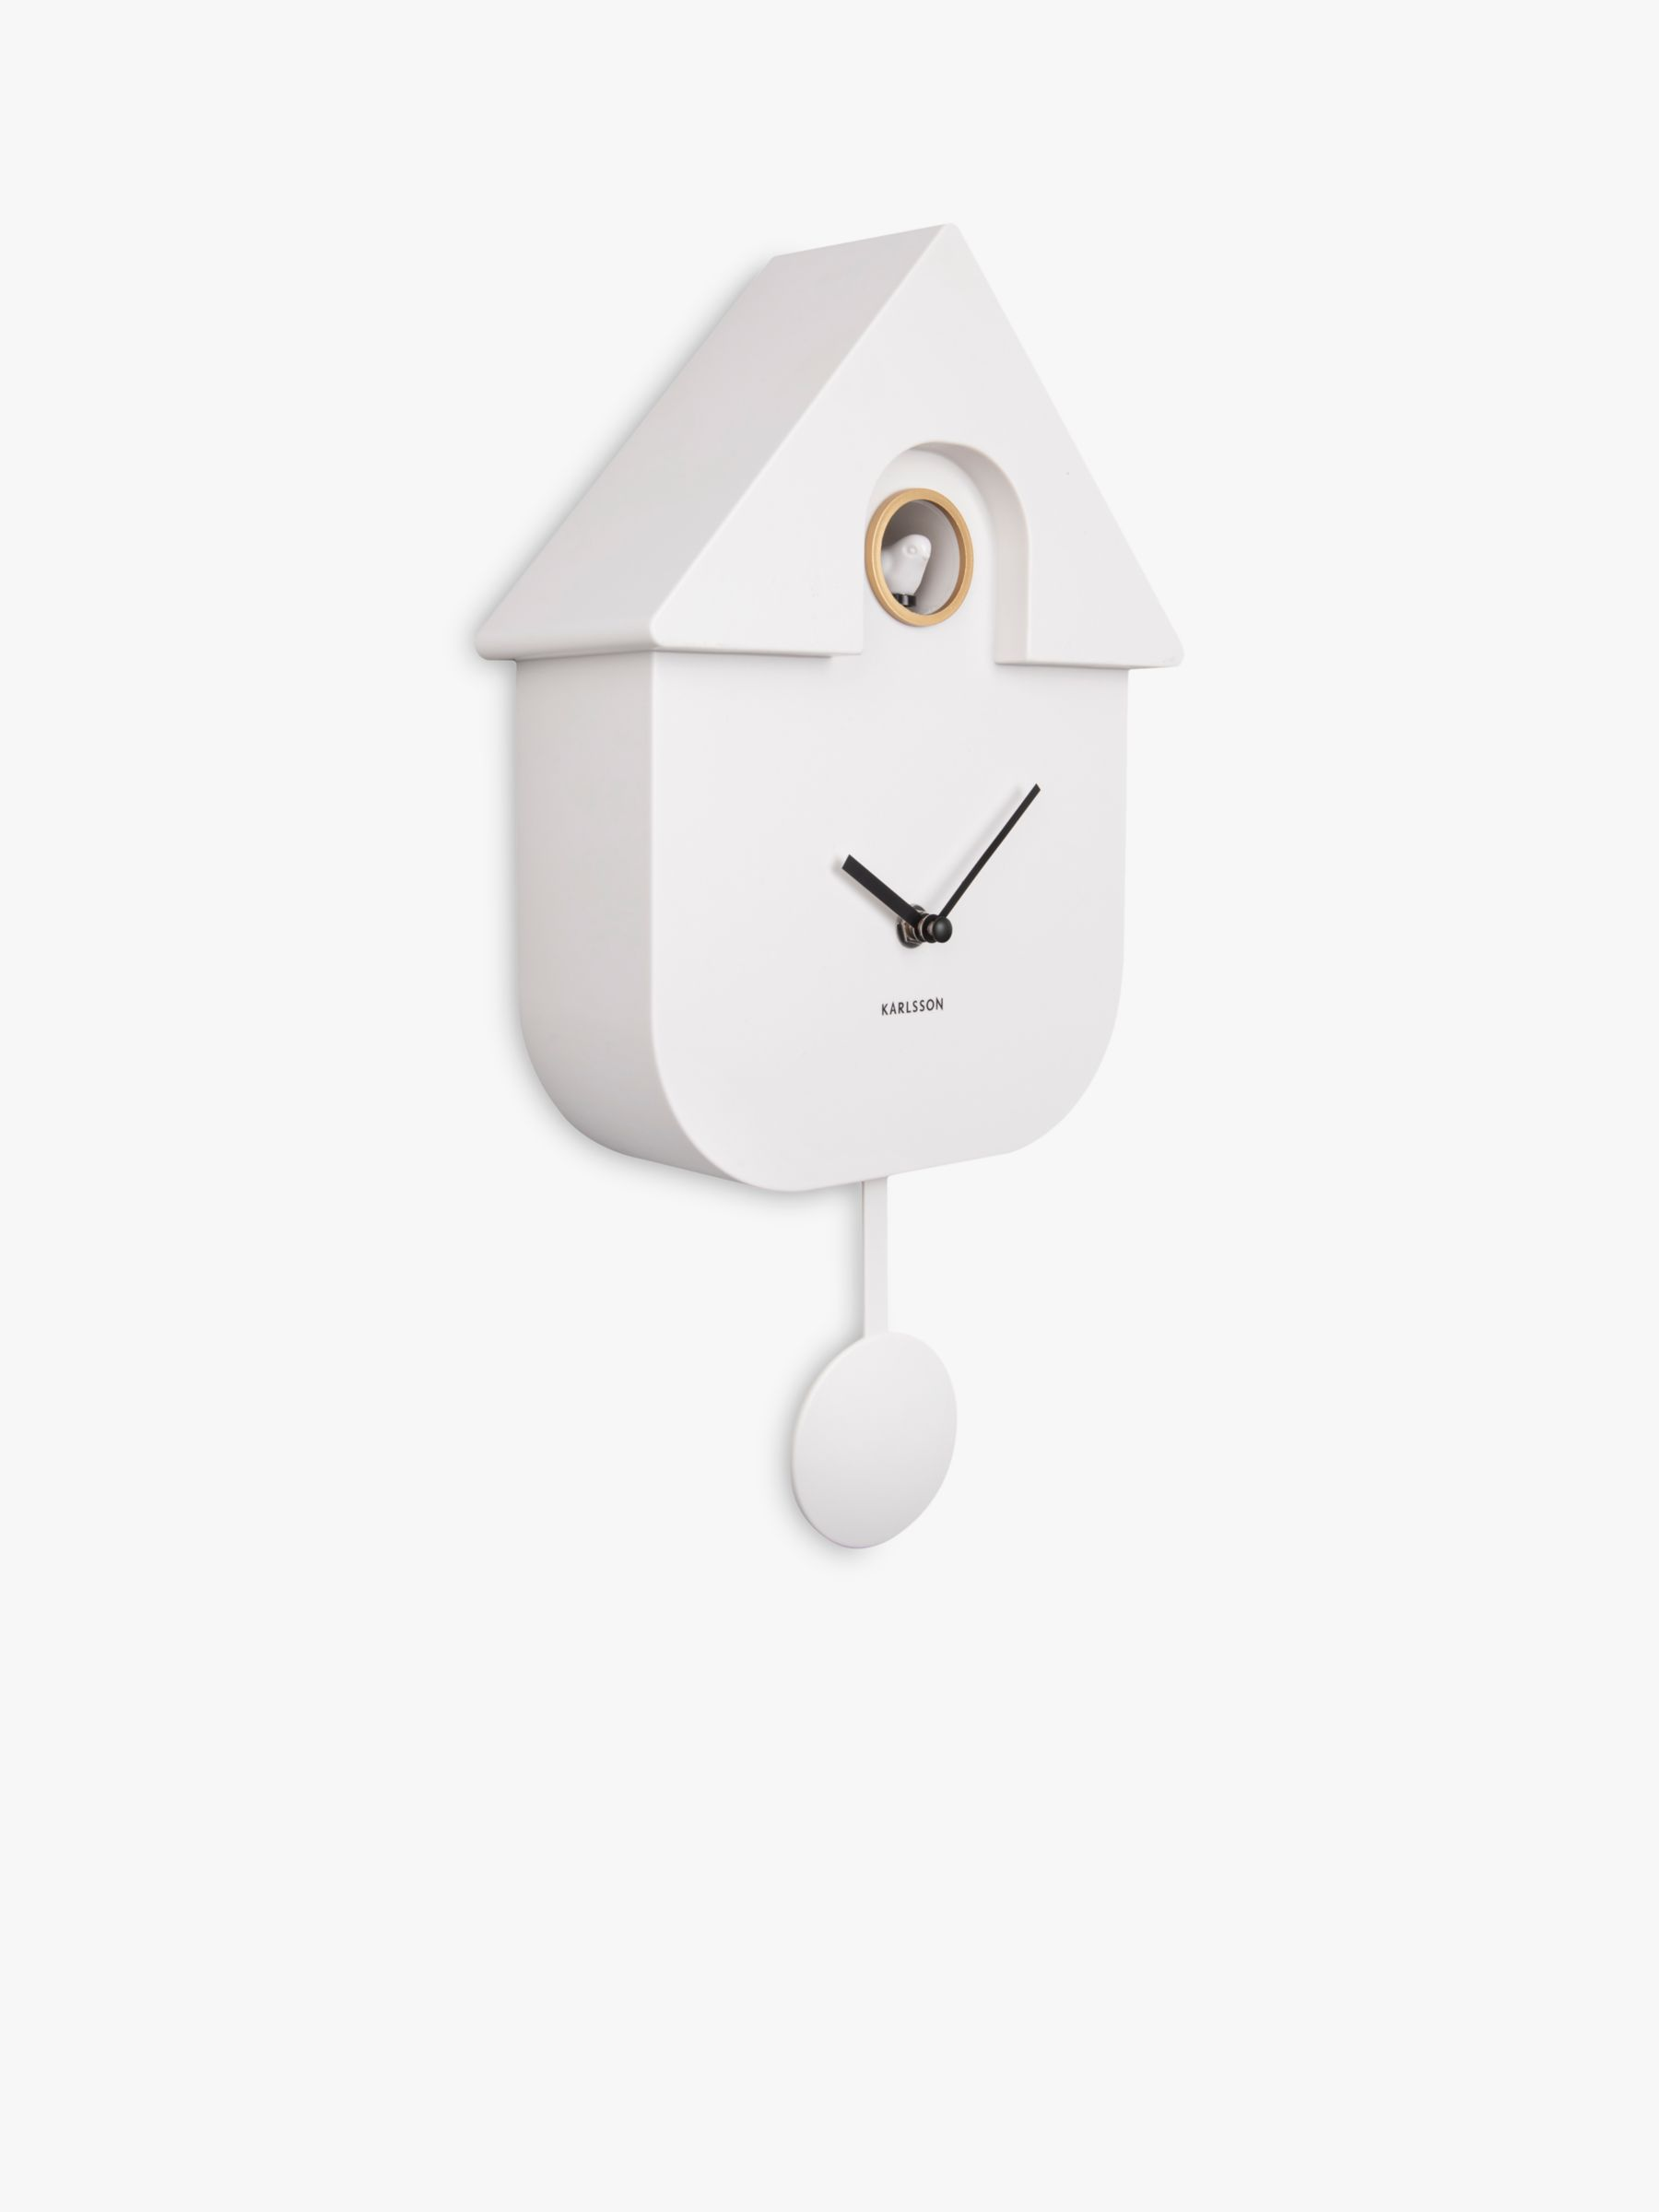 Karlsson Modern Tweeting Cuckoo Pendulum Wall Clock, 41cm